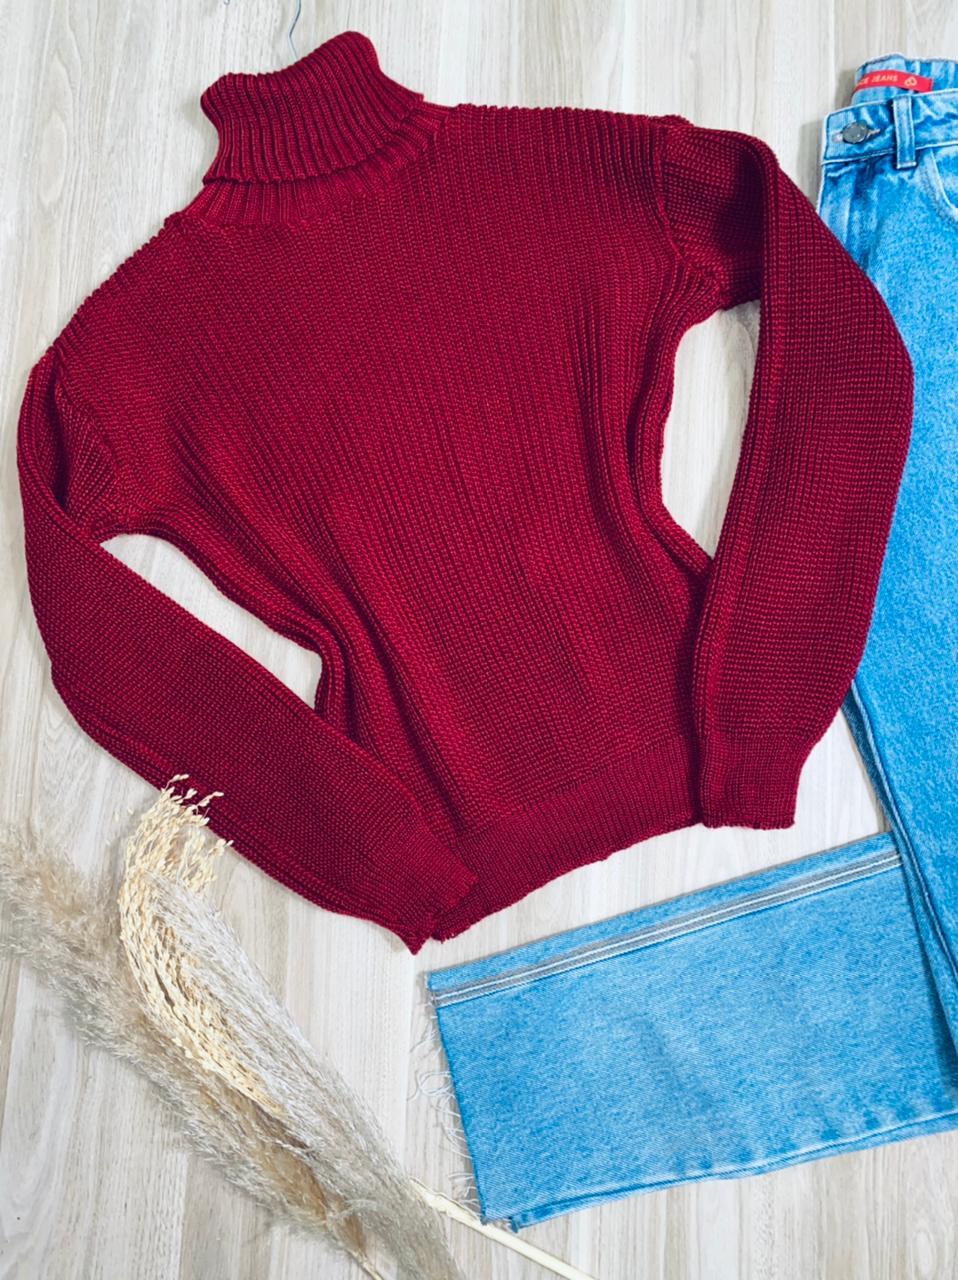 Blusa Tricot Gola Alta com Punho Laura Fashion Vinho